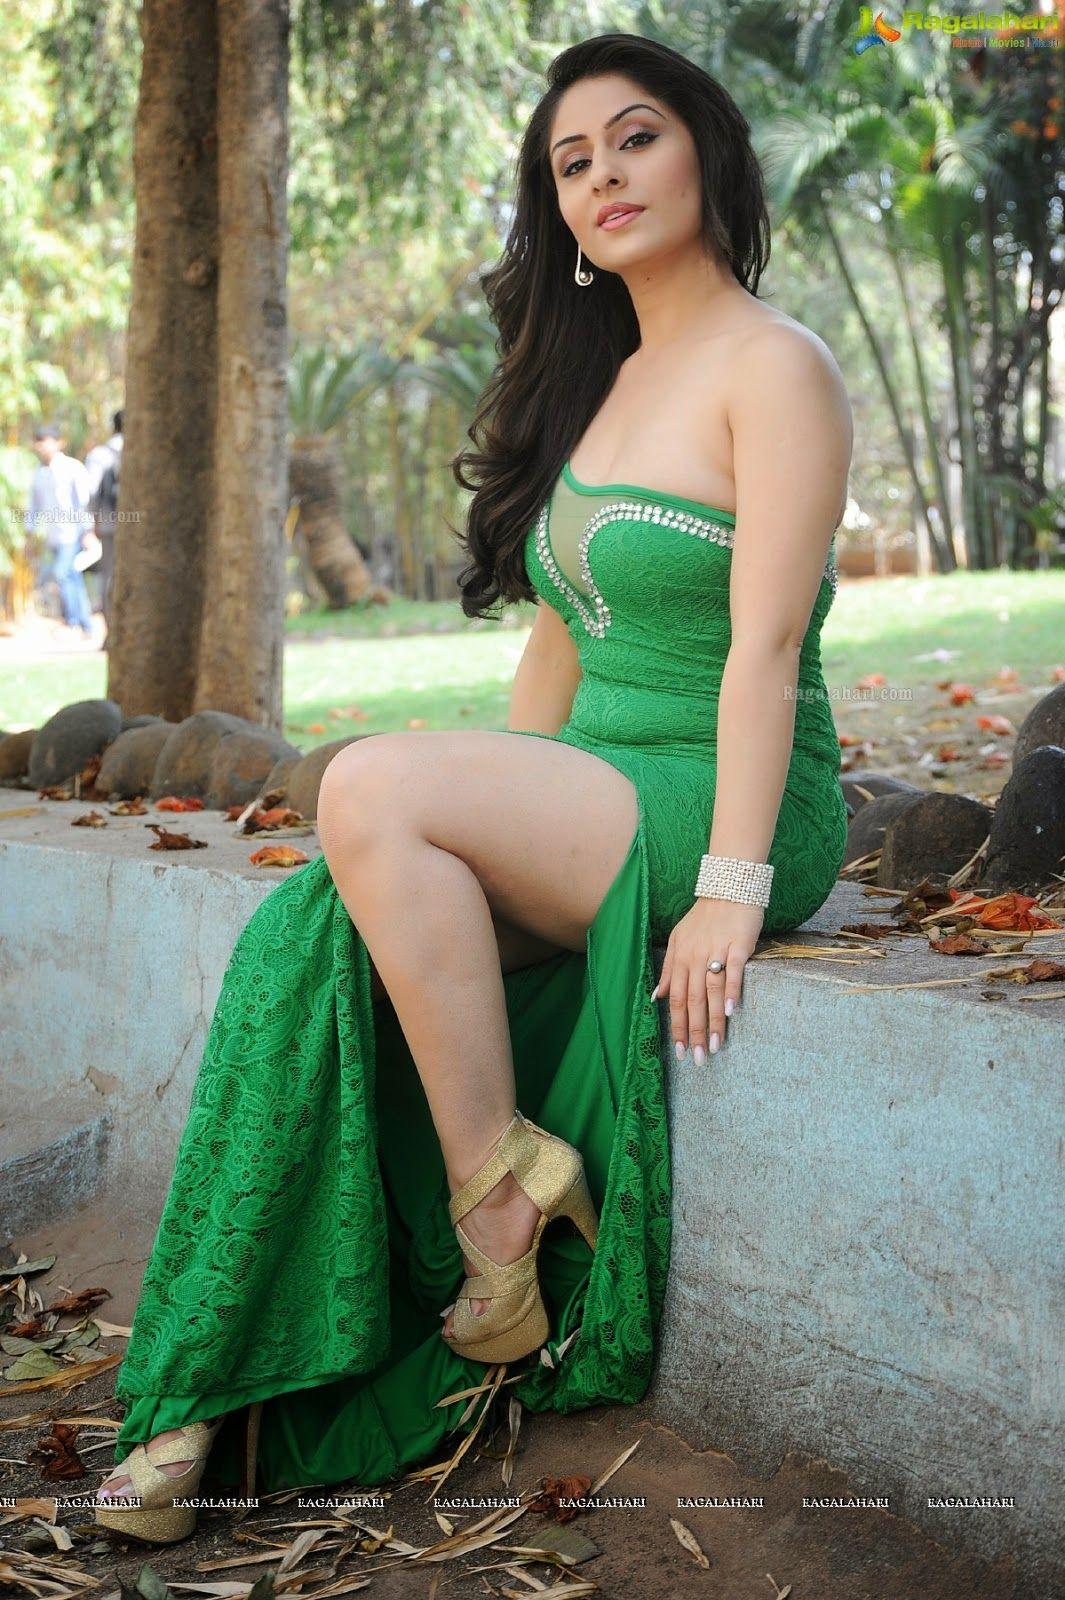 Watch Ankitta Sharma 2011 video